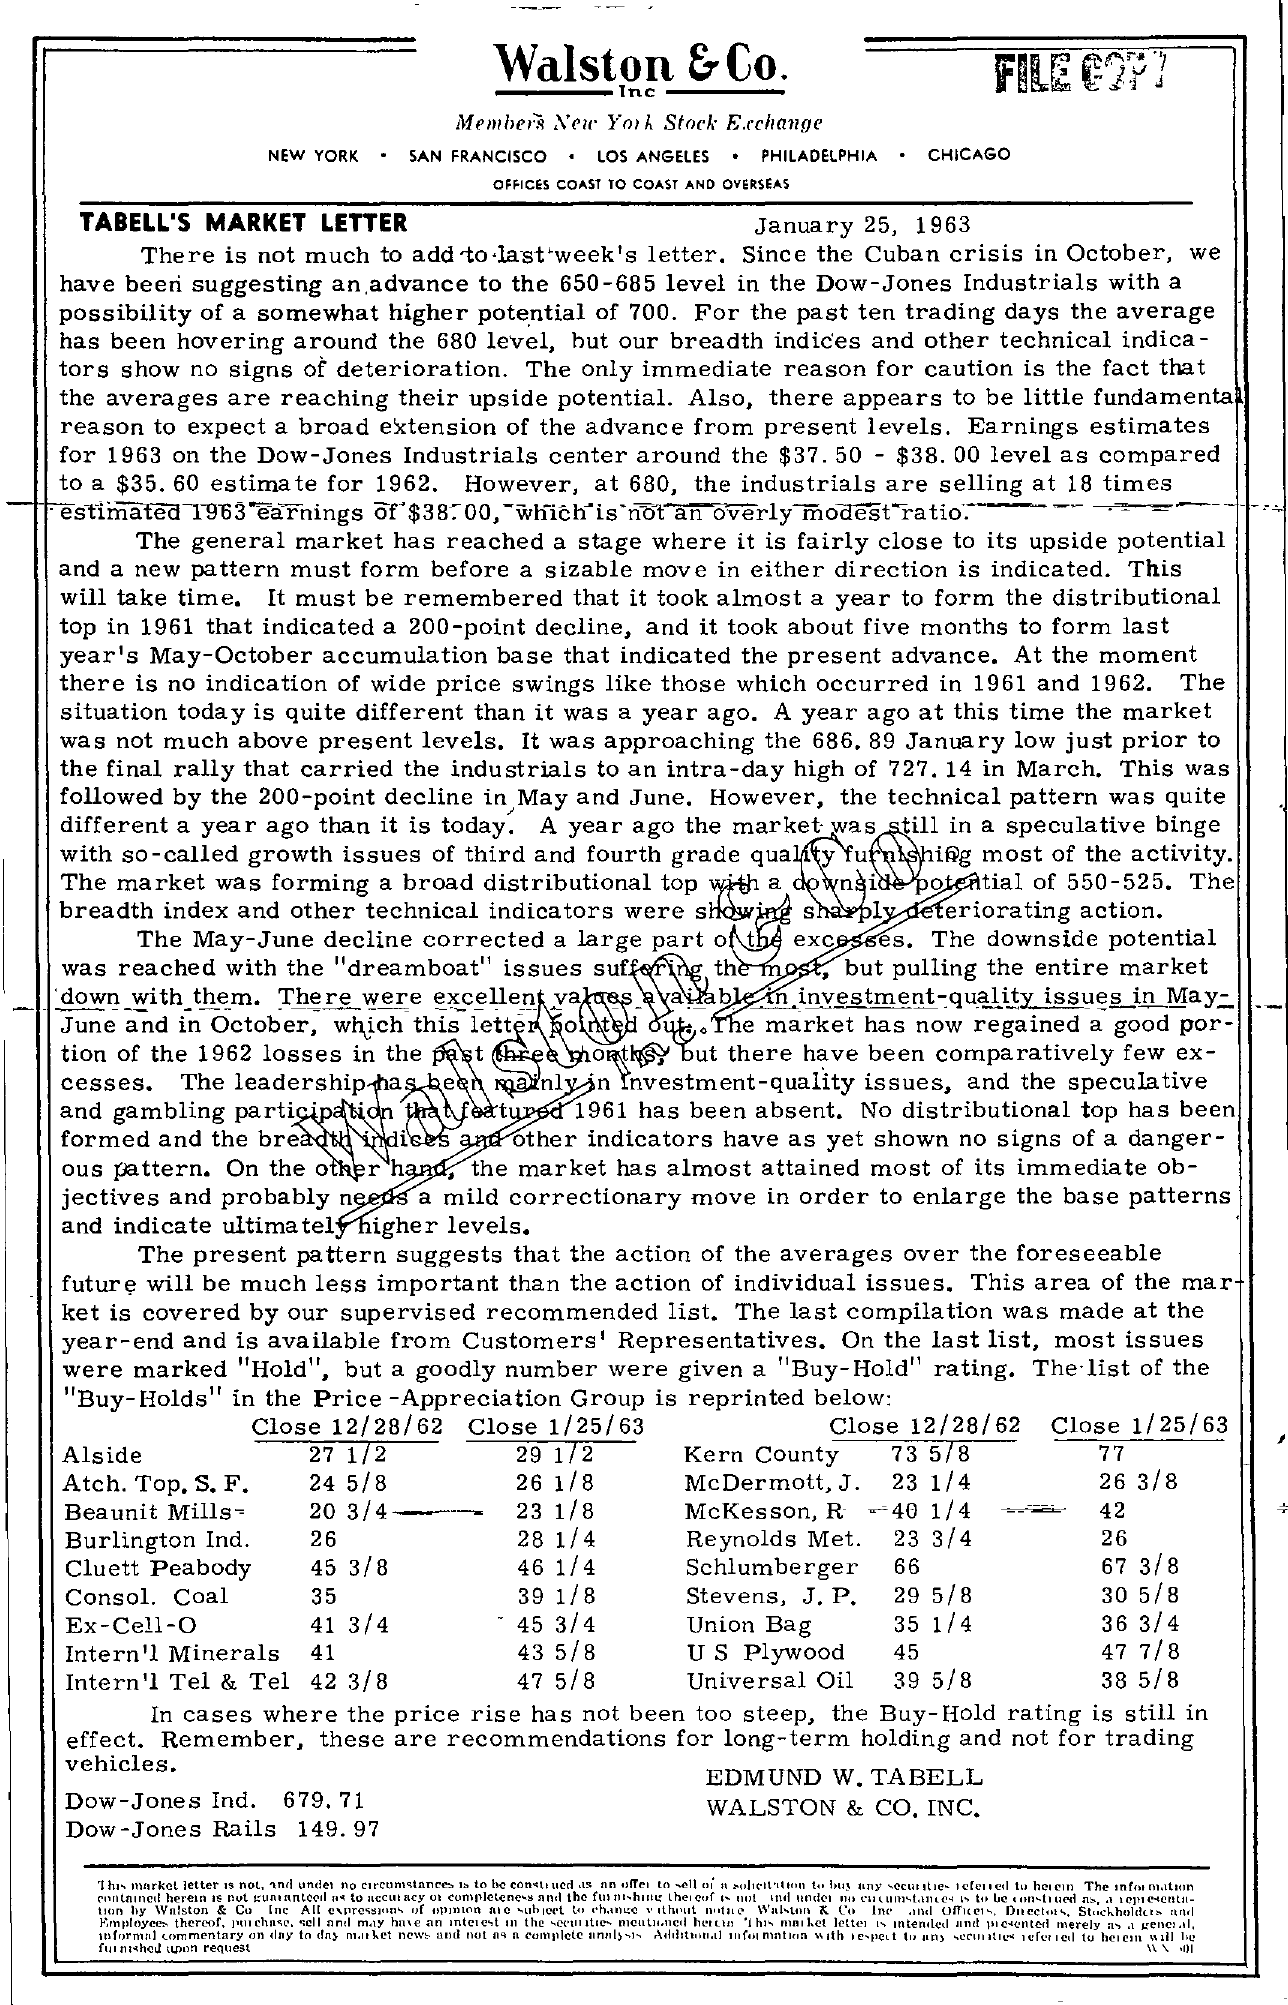 Tabell's Market Letter - January 25, 1963